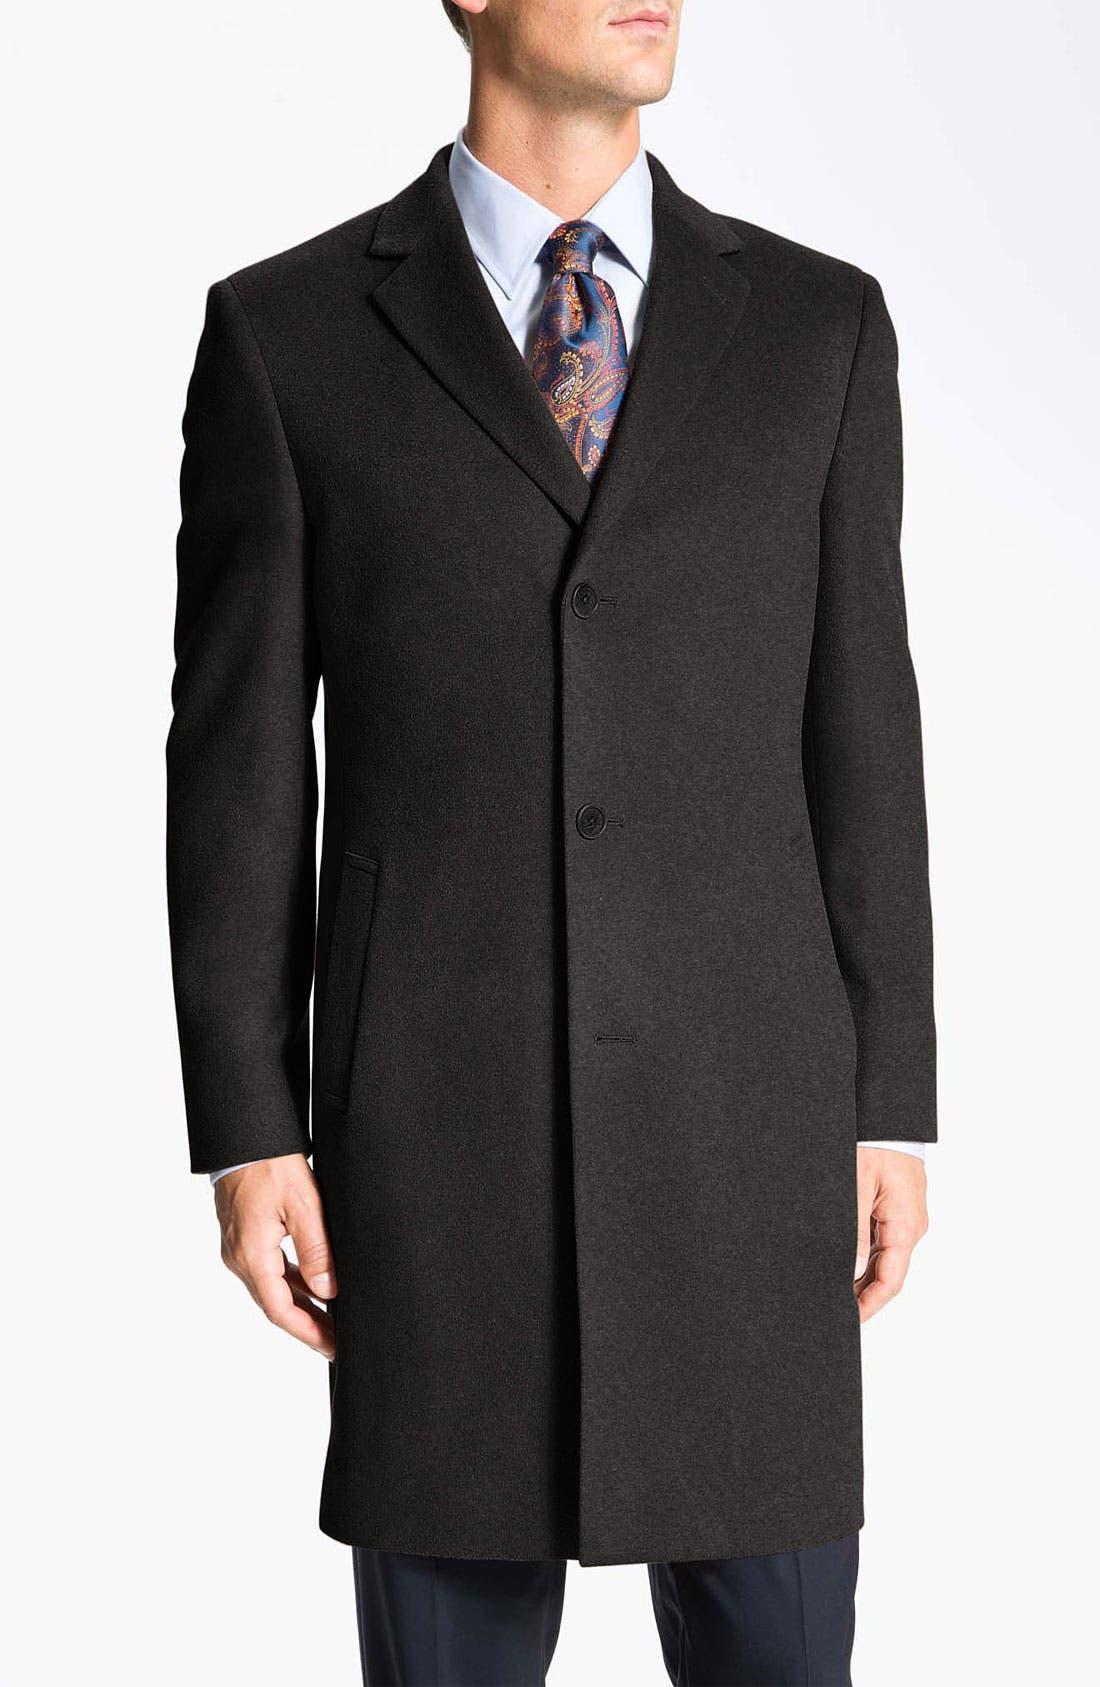 Alternate Image 1 Selected - John W. Nordstrom® Signature 'Clifton' Cashmere Top Coat